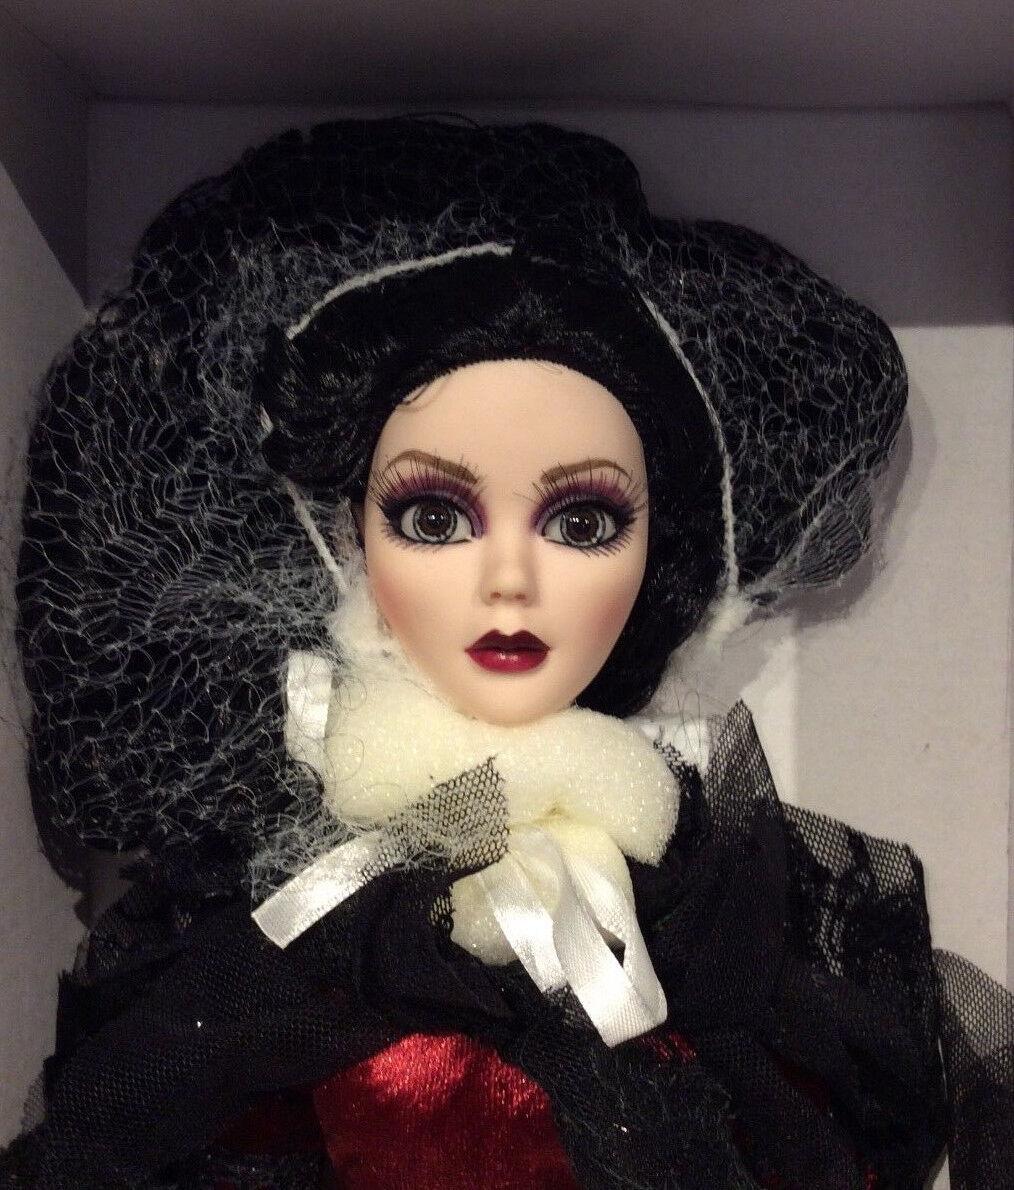 Evangeline Ghastly Loves Sweets doll NRFB LE 125 Tonner 2015 convention